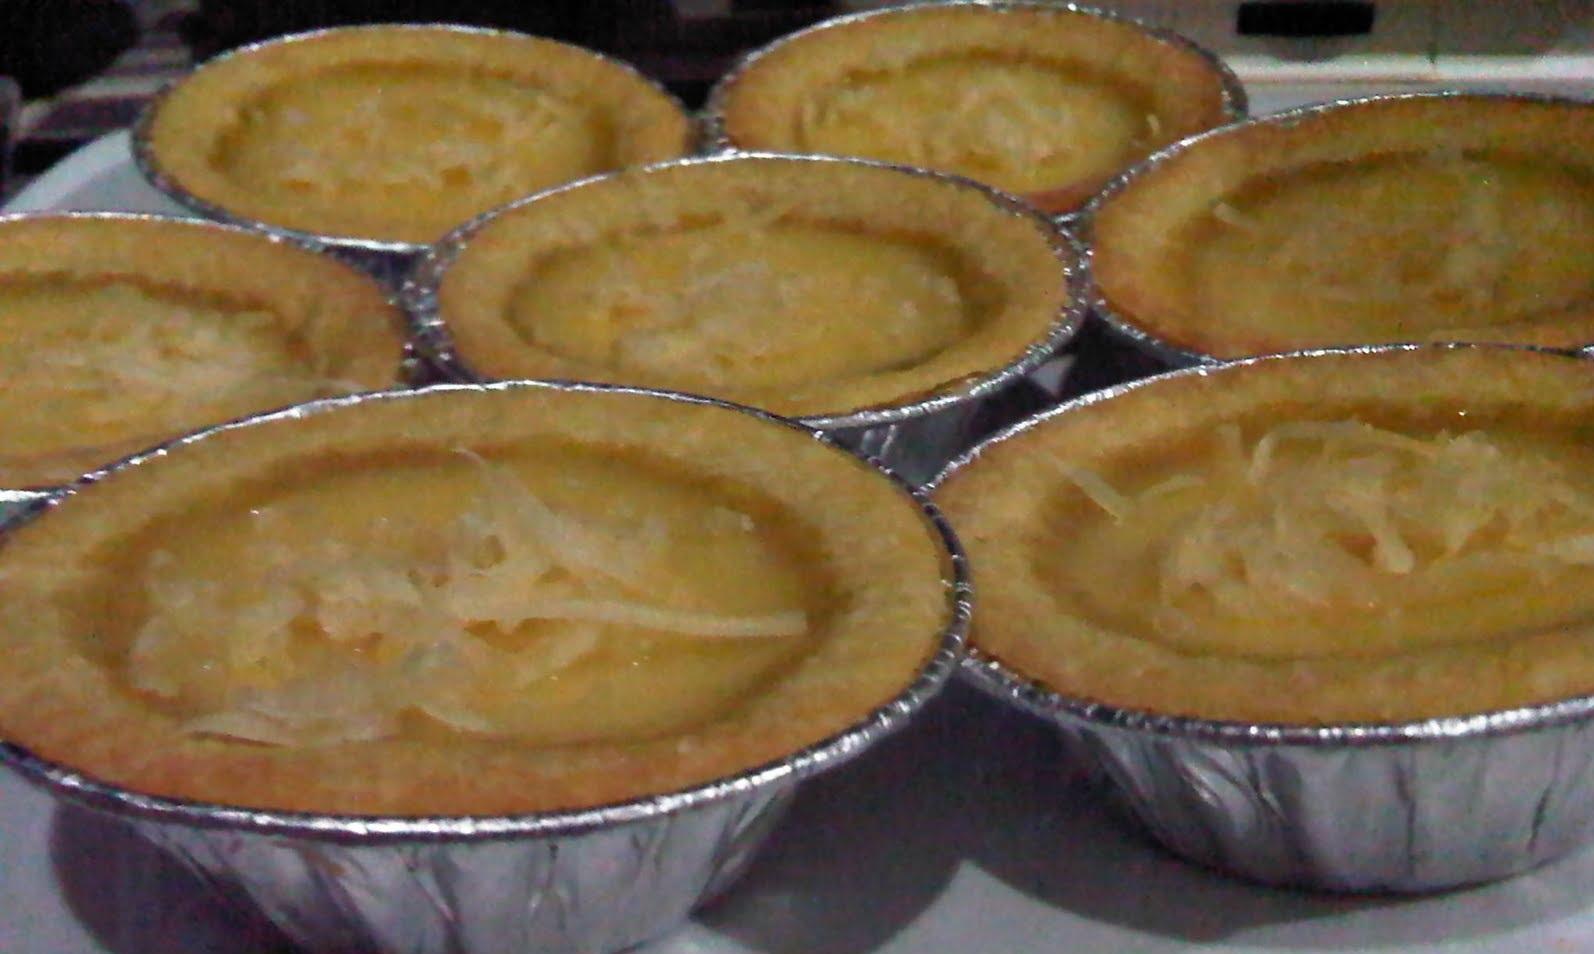 Resep kue kering lebaran 2013 pusat resep masakan